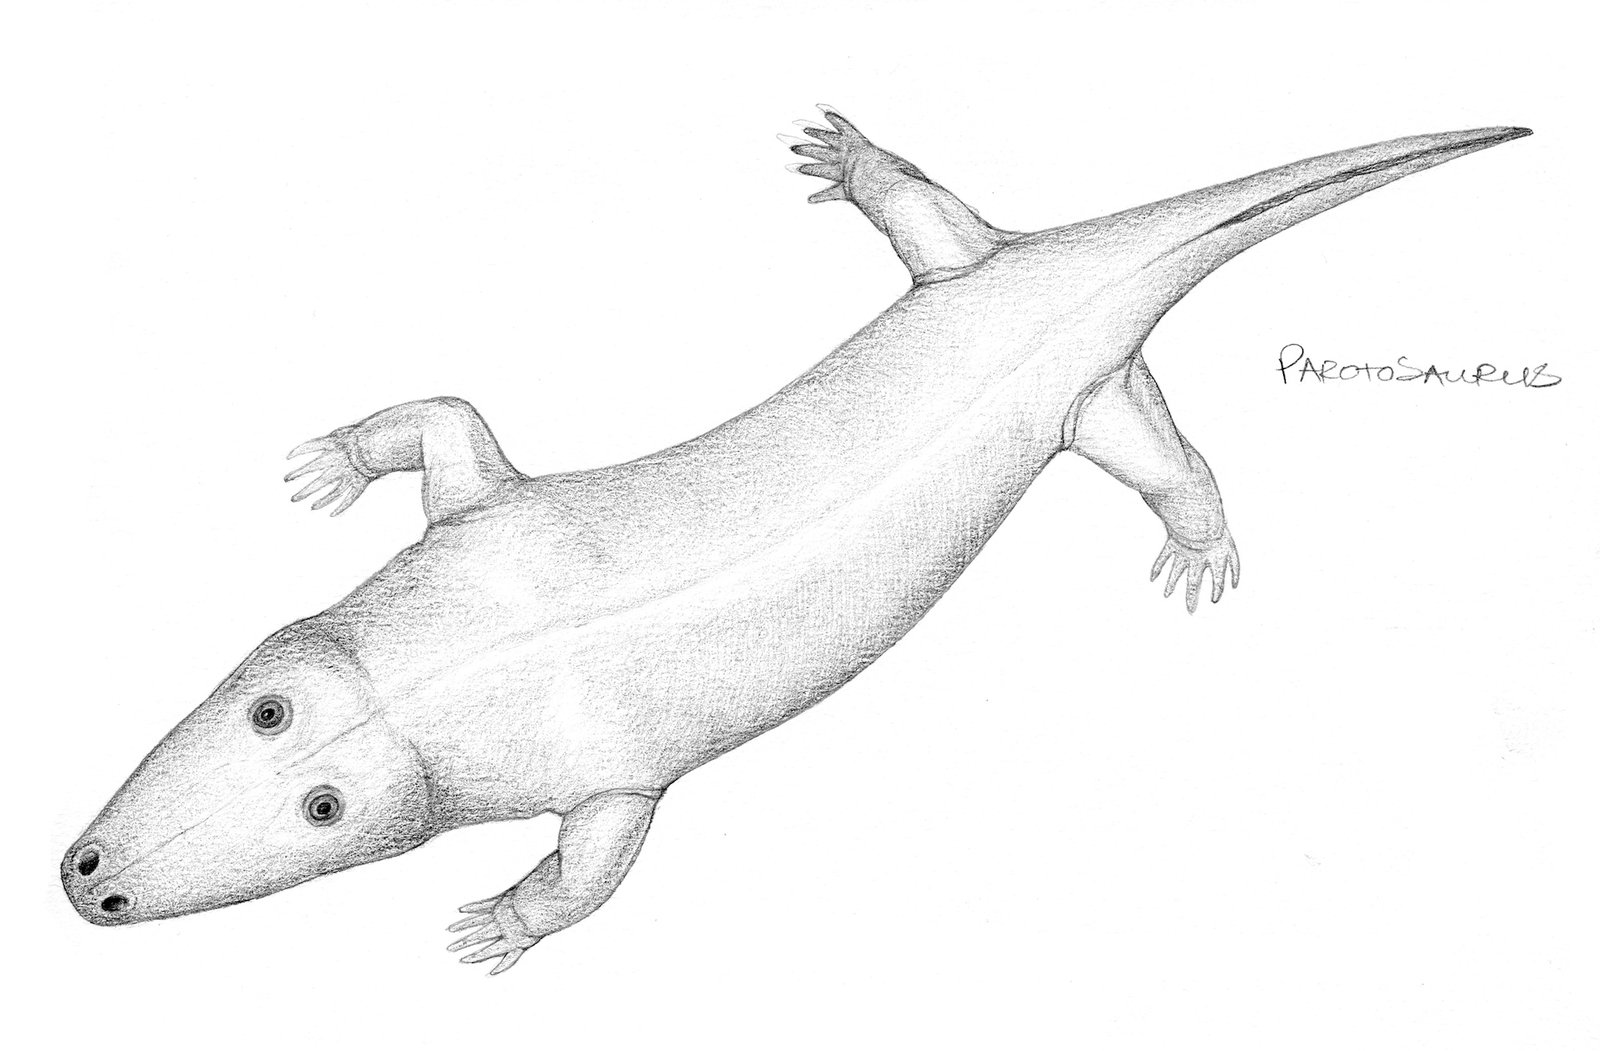 Labyrinthodont amphibian, Parotosaurus wadei